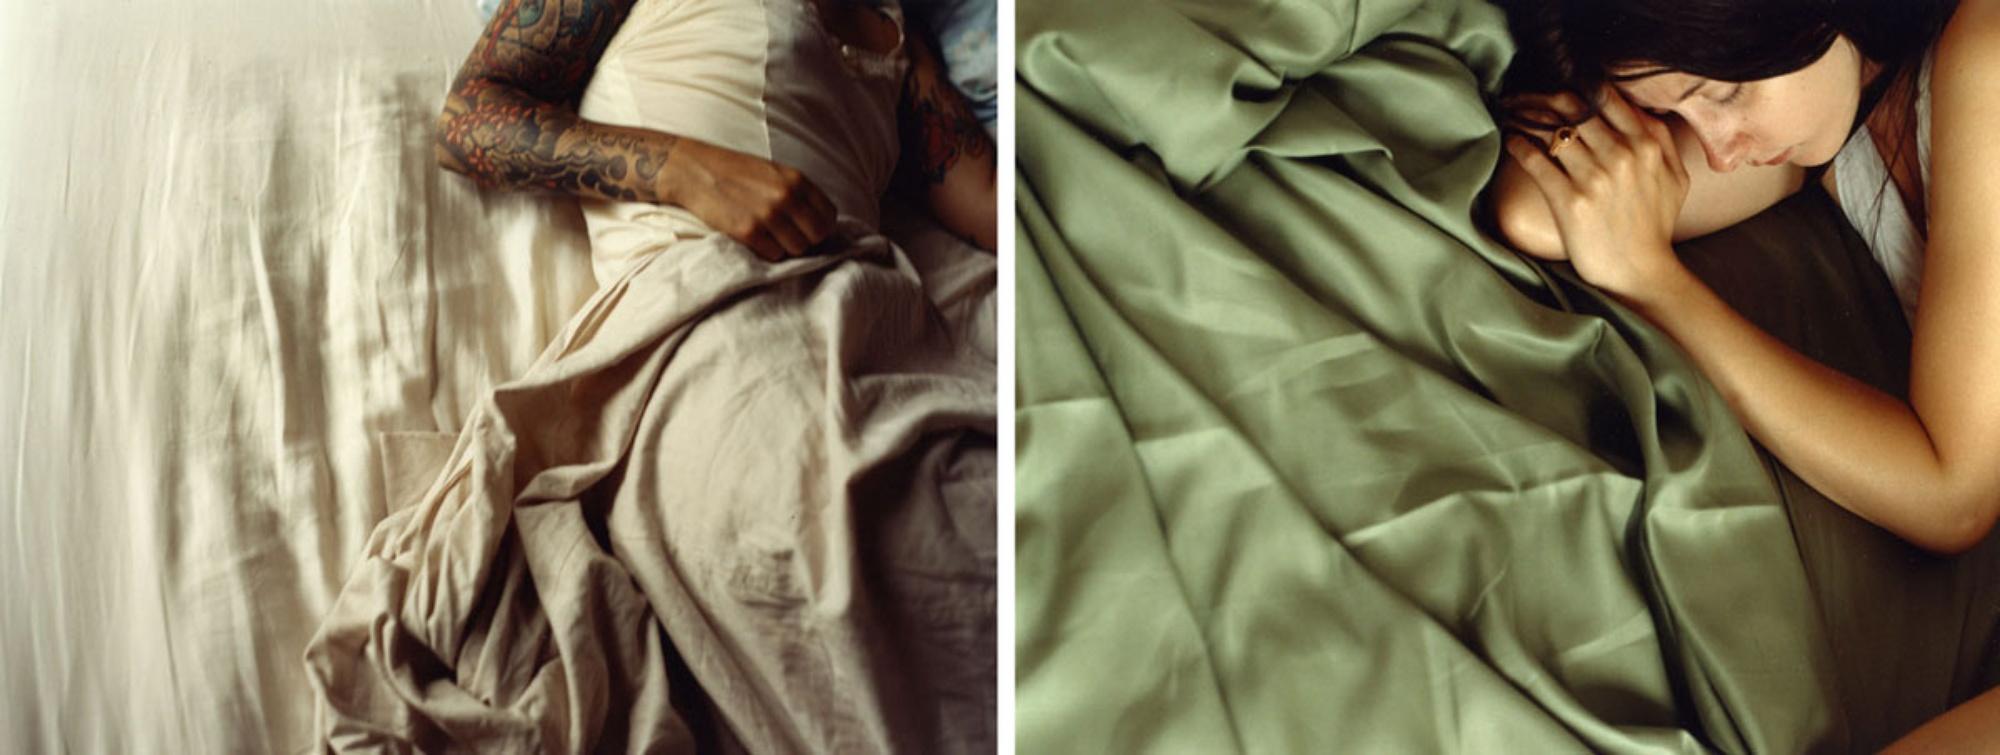 sleep-studies-flora-hanitijo-goodfromyou-1.jpg